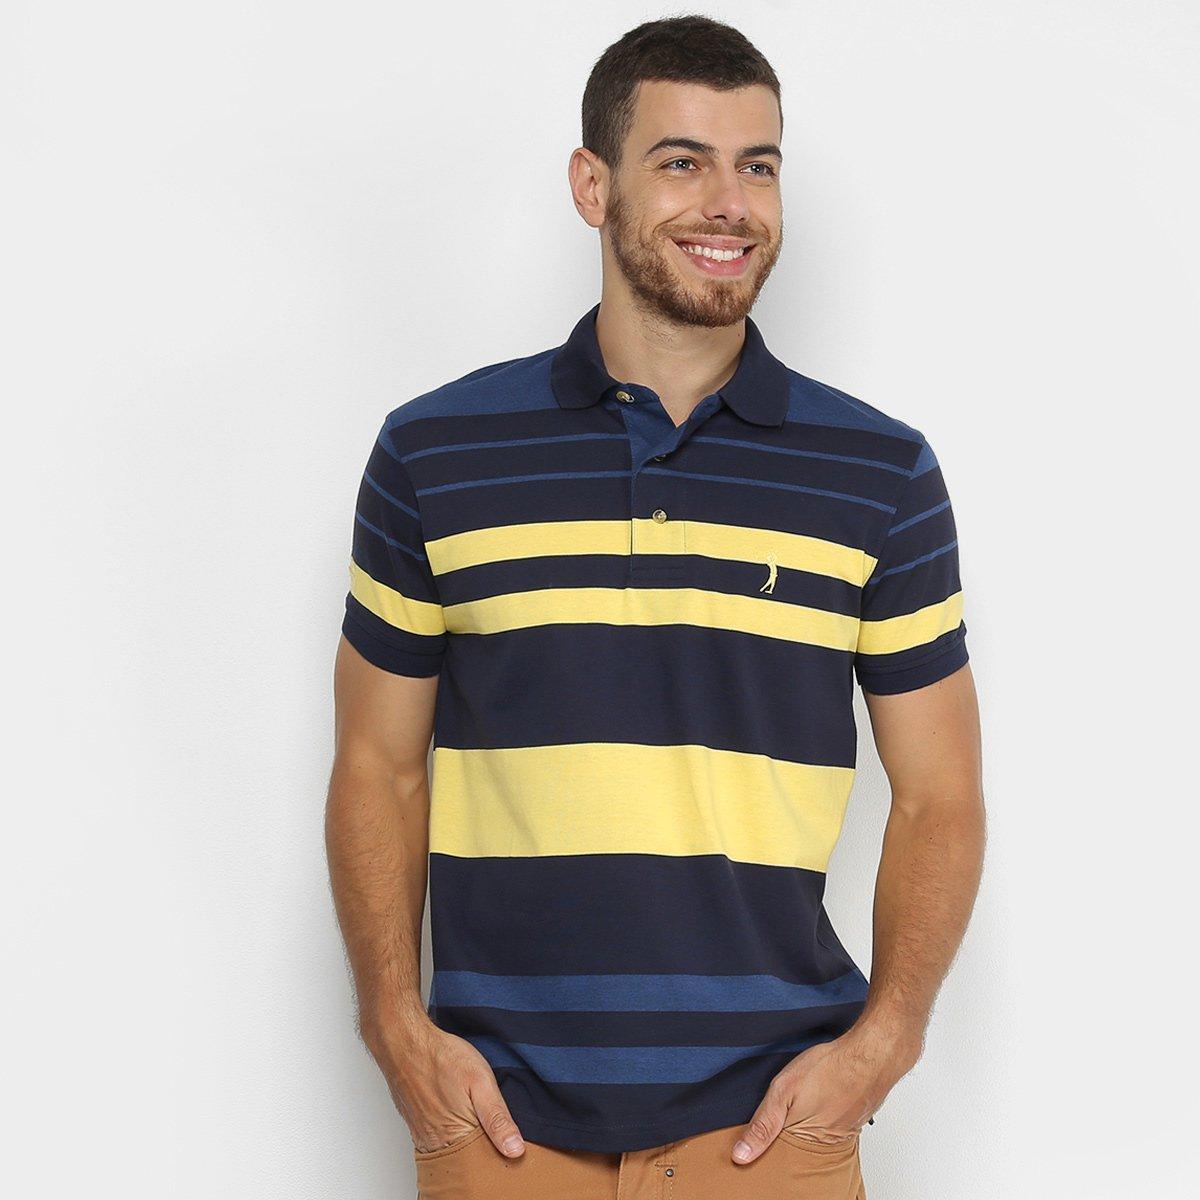 Camisa Polo Aleatory Fio Tinto Listras Masculina 7f2d49cb7d3f0